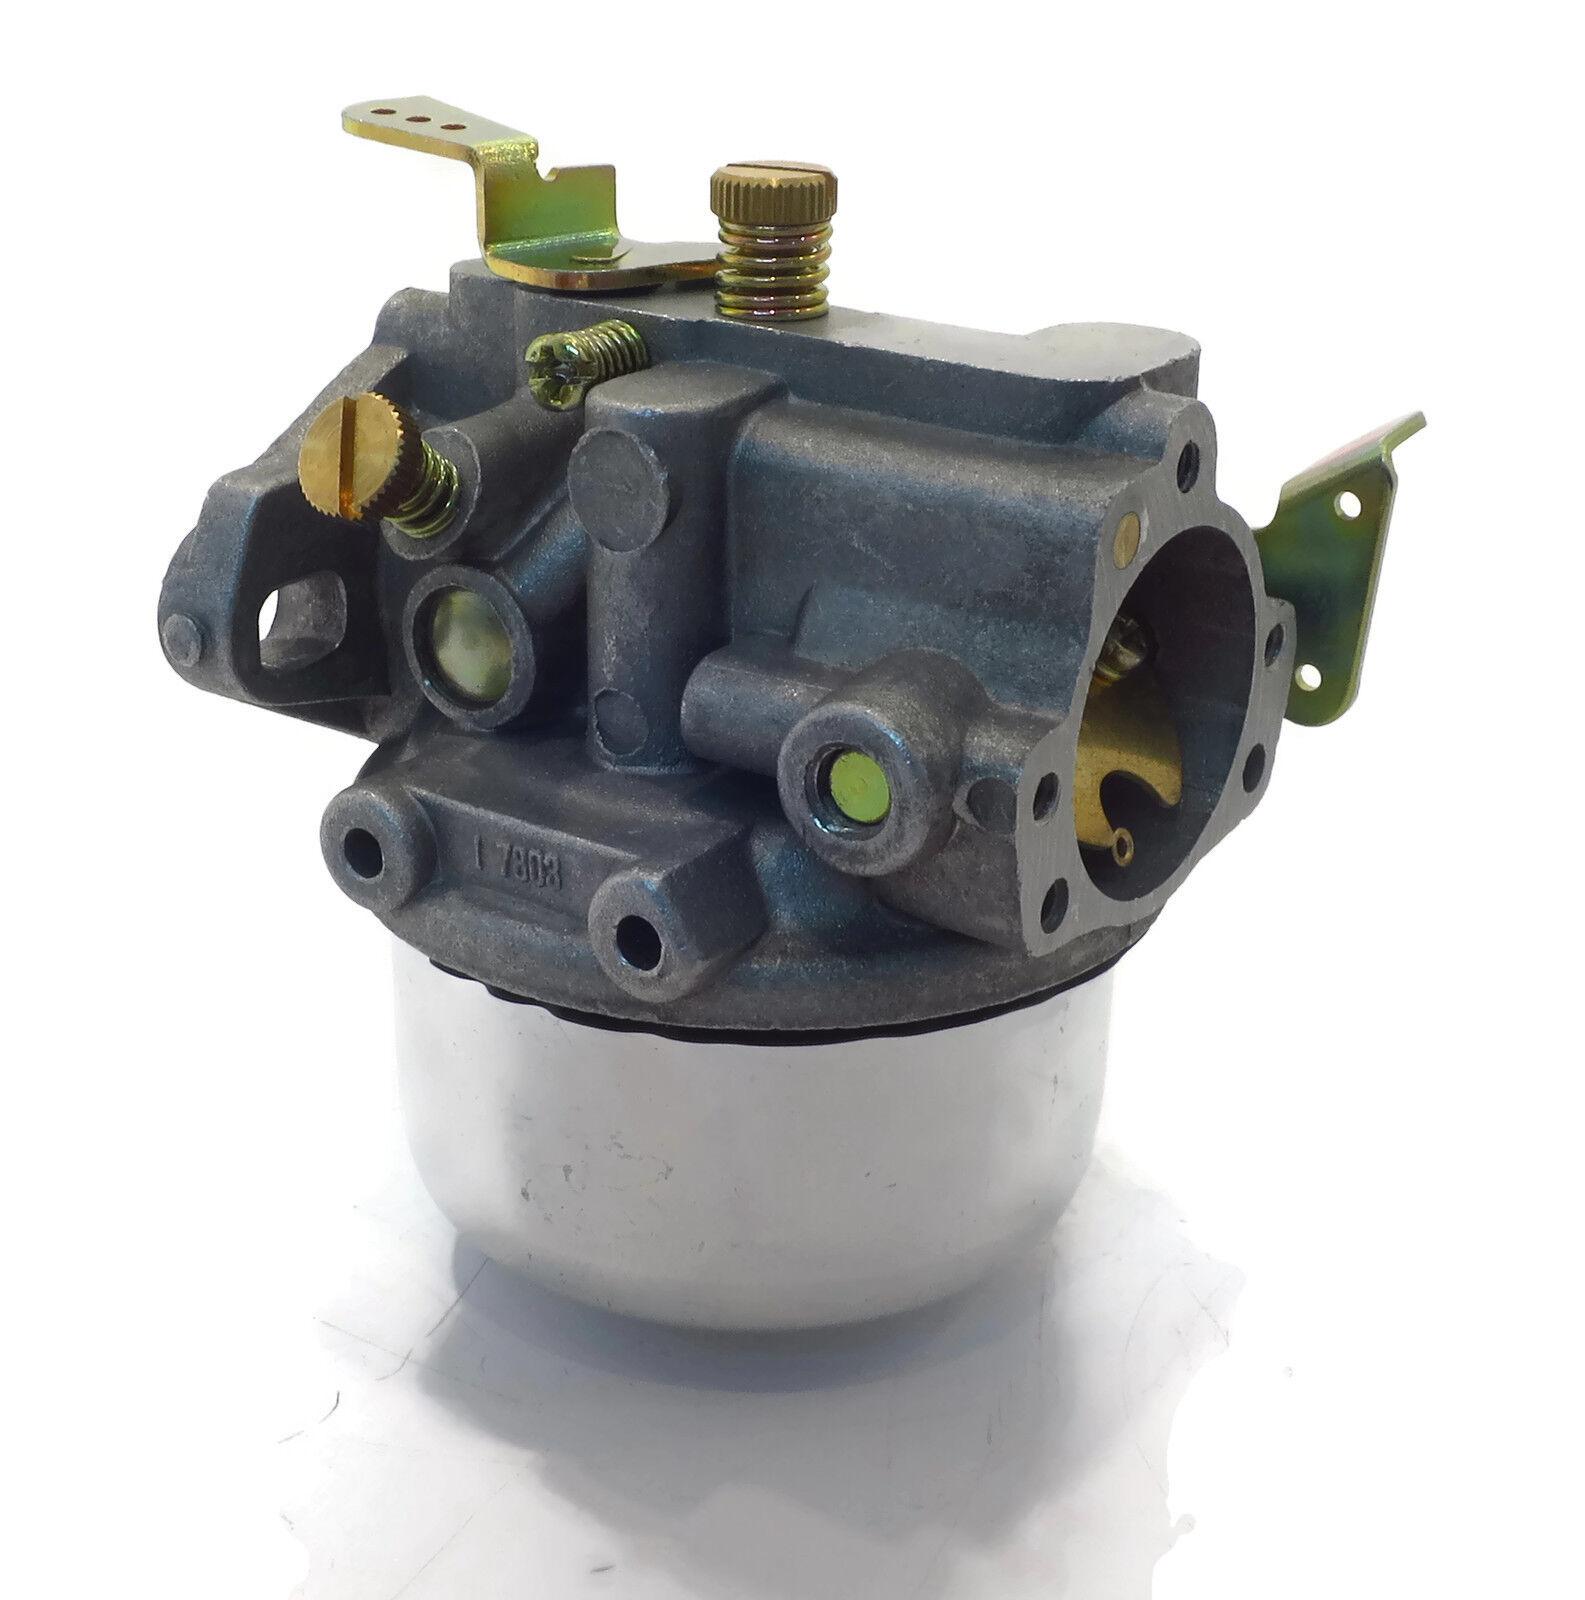 Kohler K90 K91 K141 K160 K161 K181 M8 Carburetor Cast Iron John Deere Cub Cadet